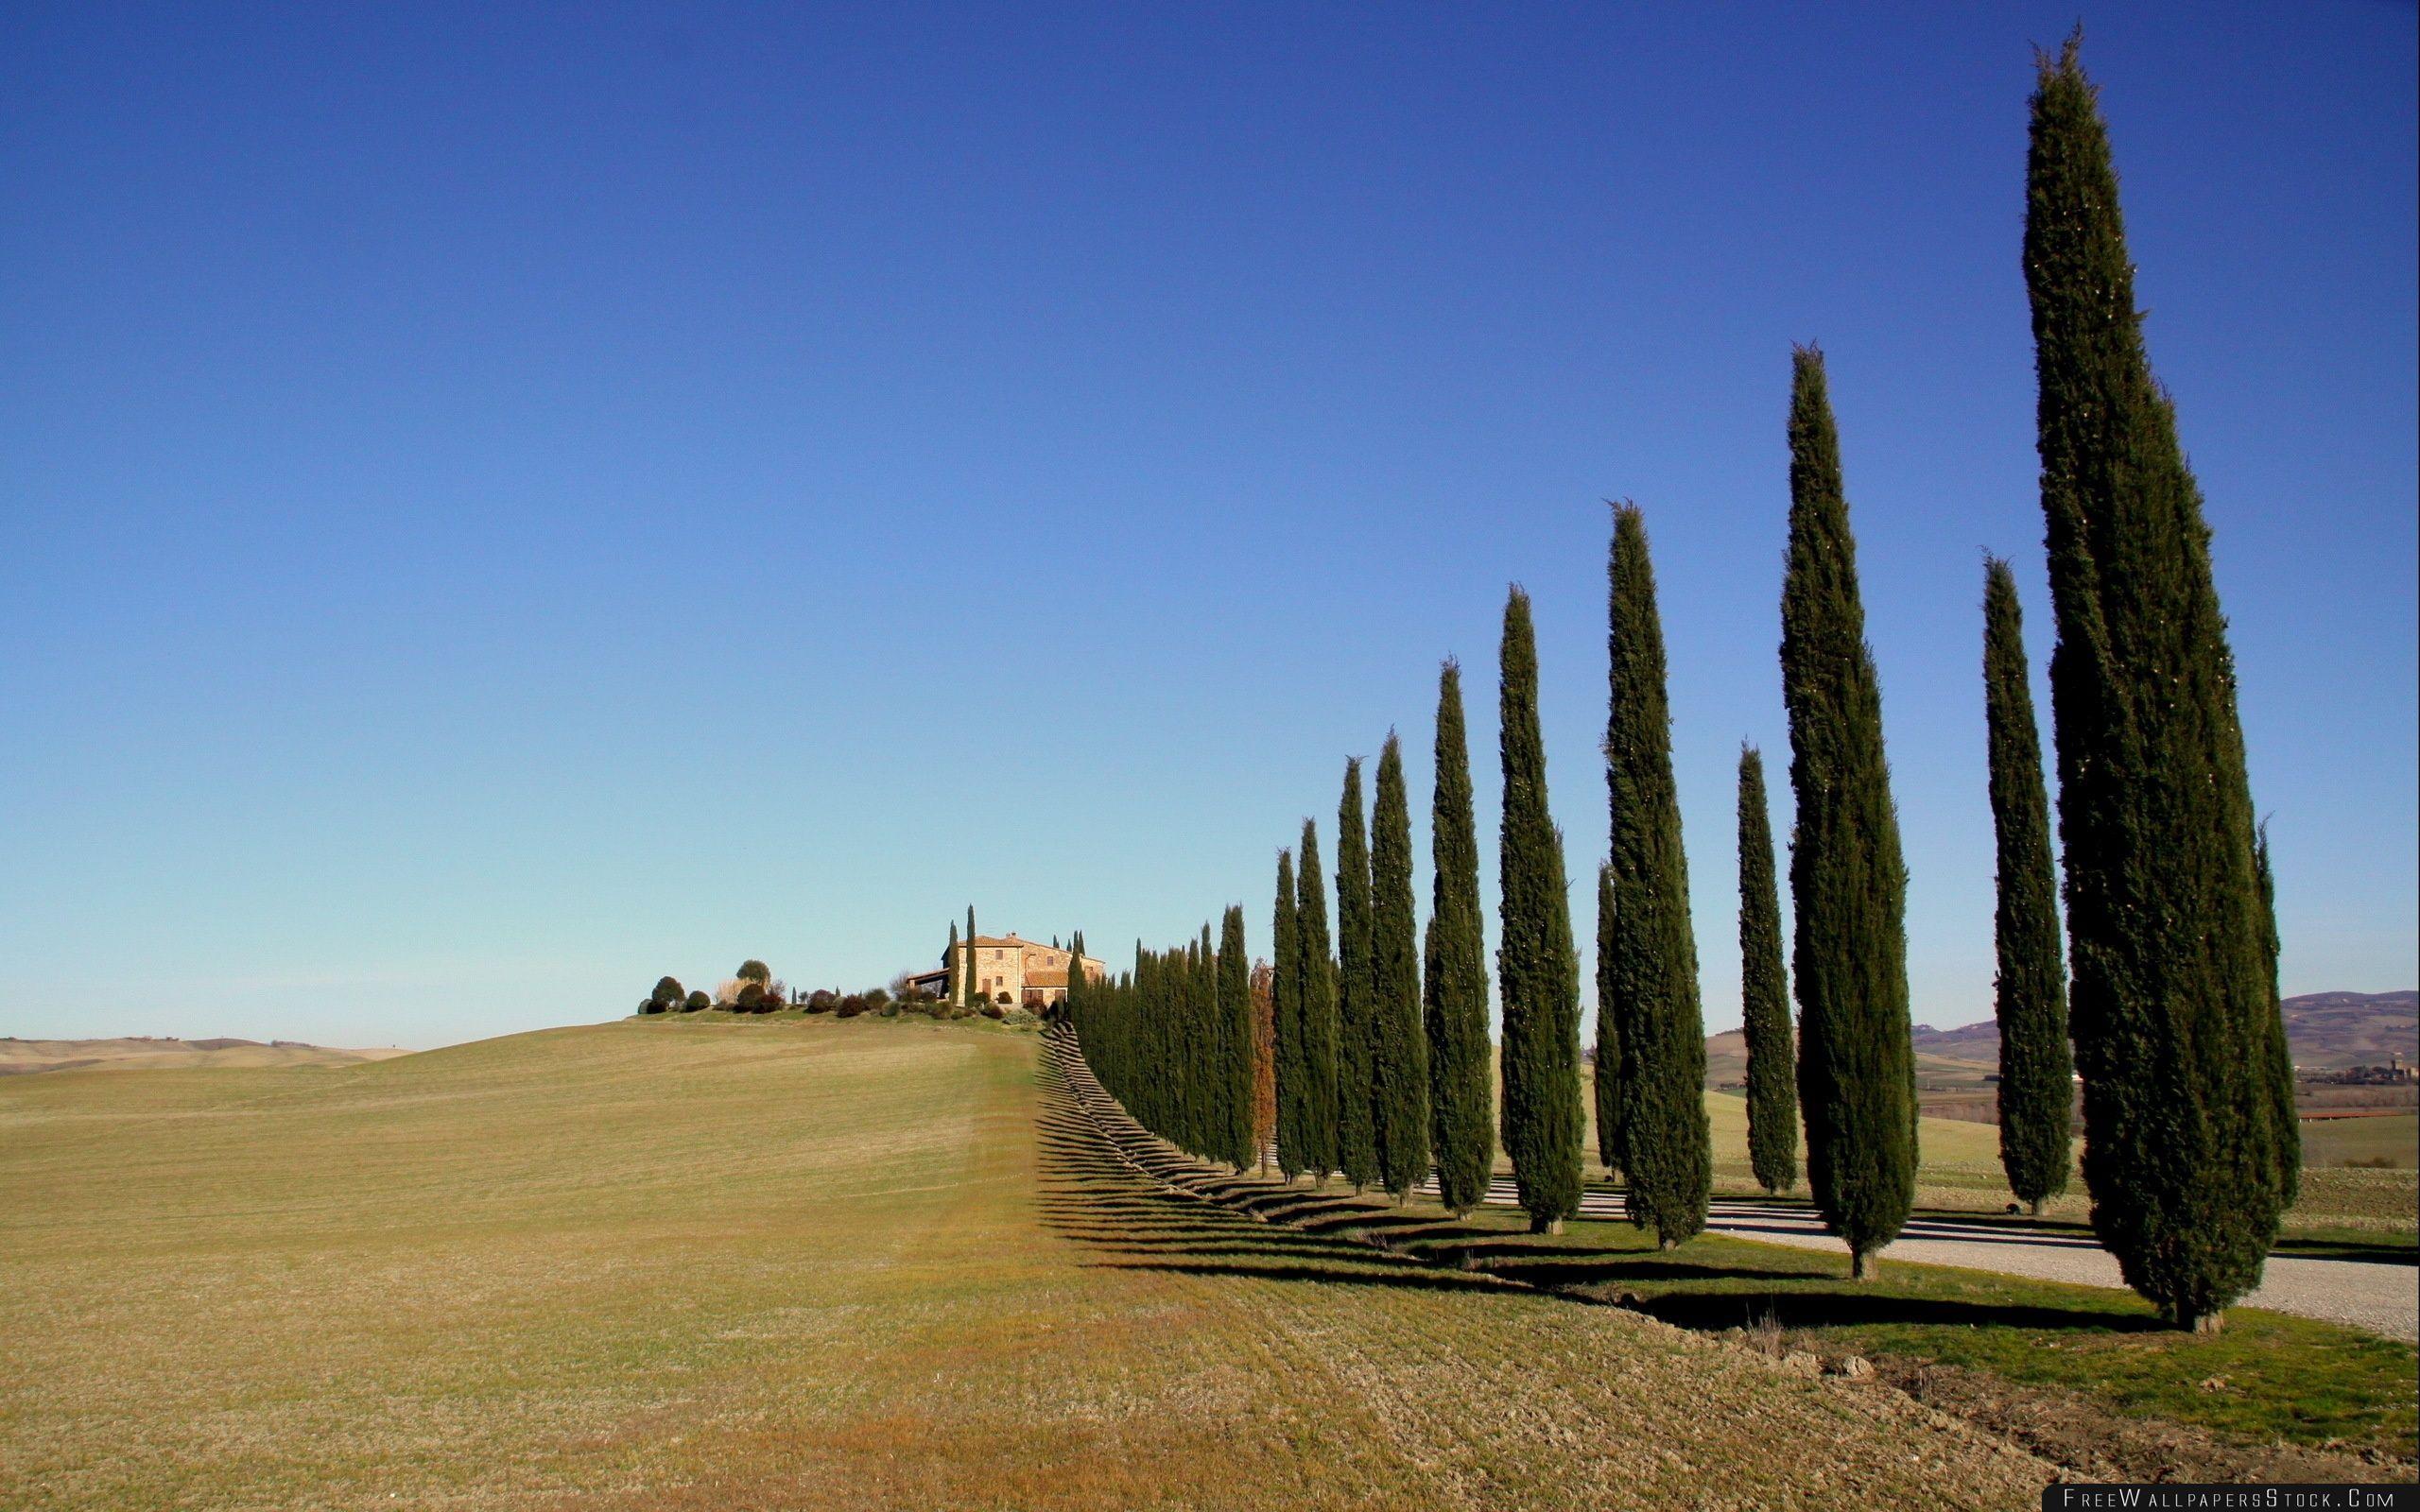 Download Free Wallpaper Tuscany Landscape